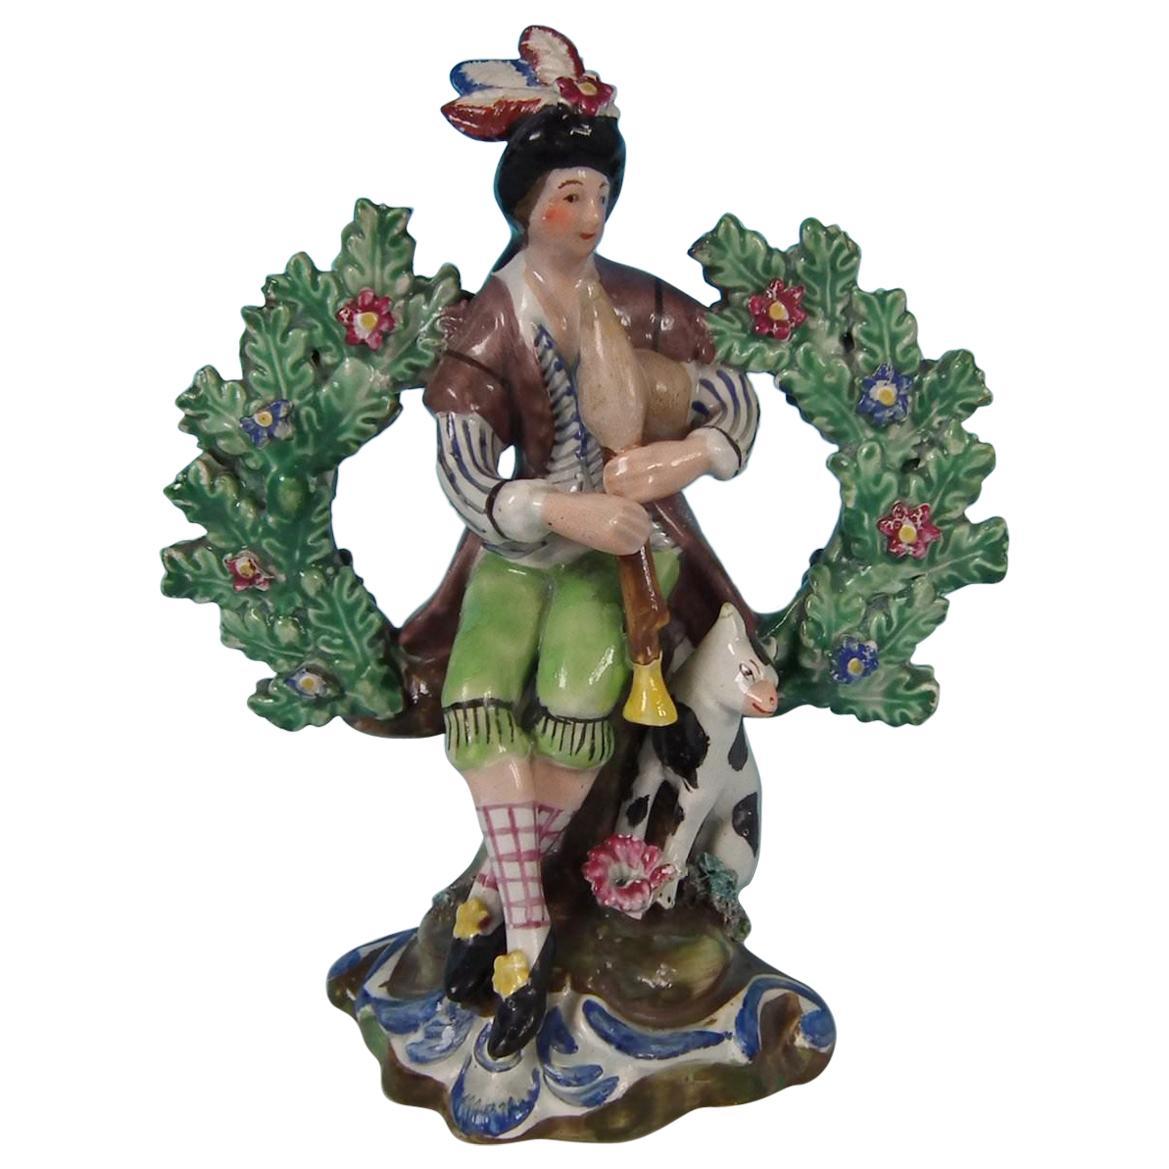 Staffordshire Pearlware Bocage Piper Figure